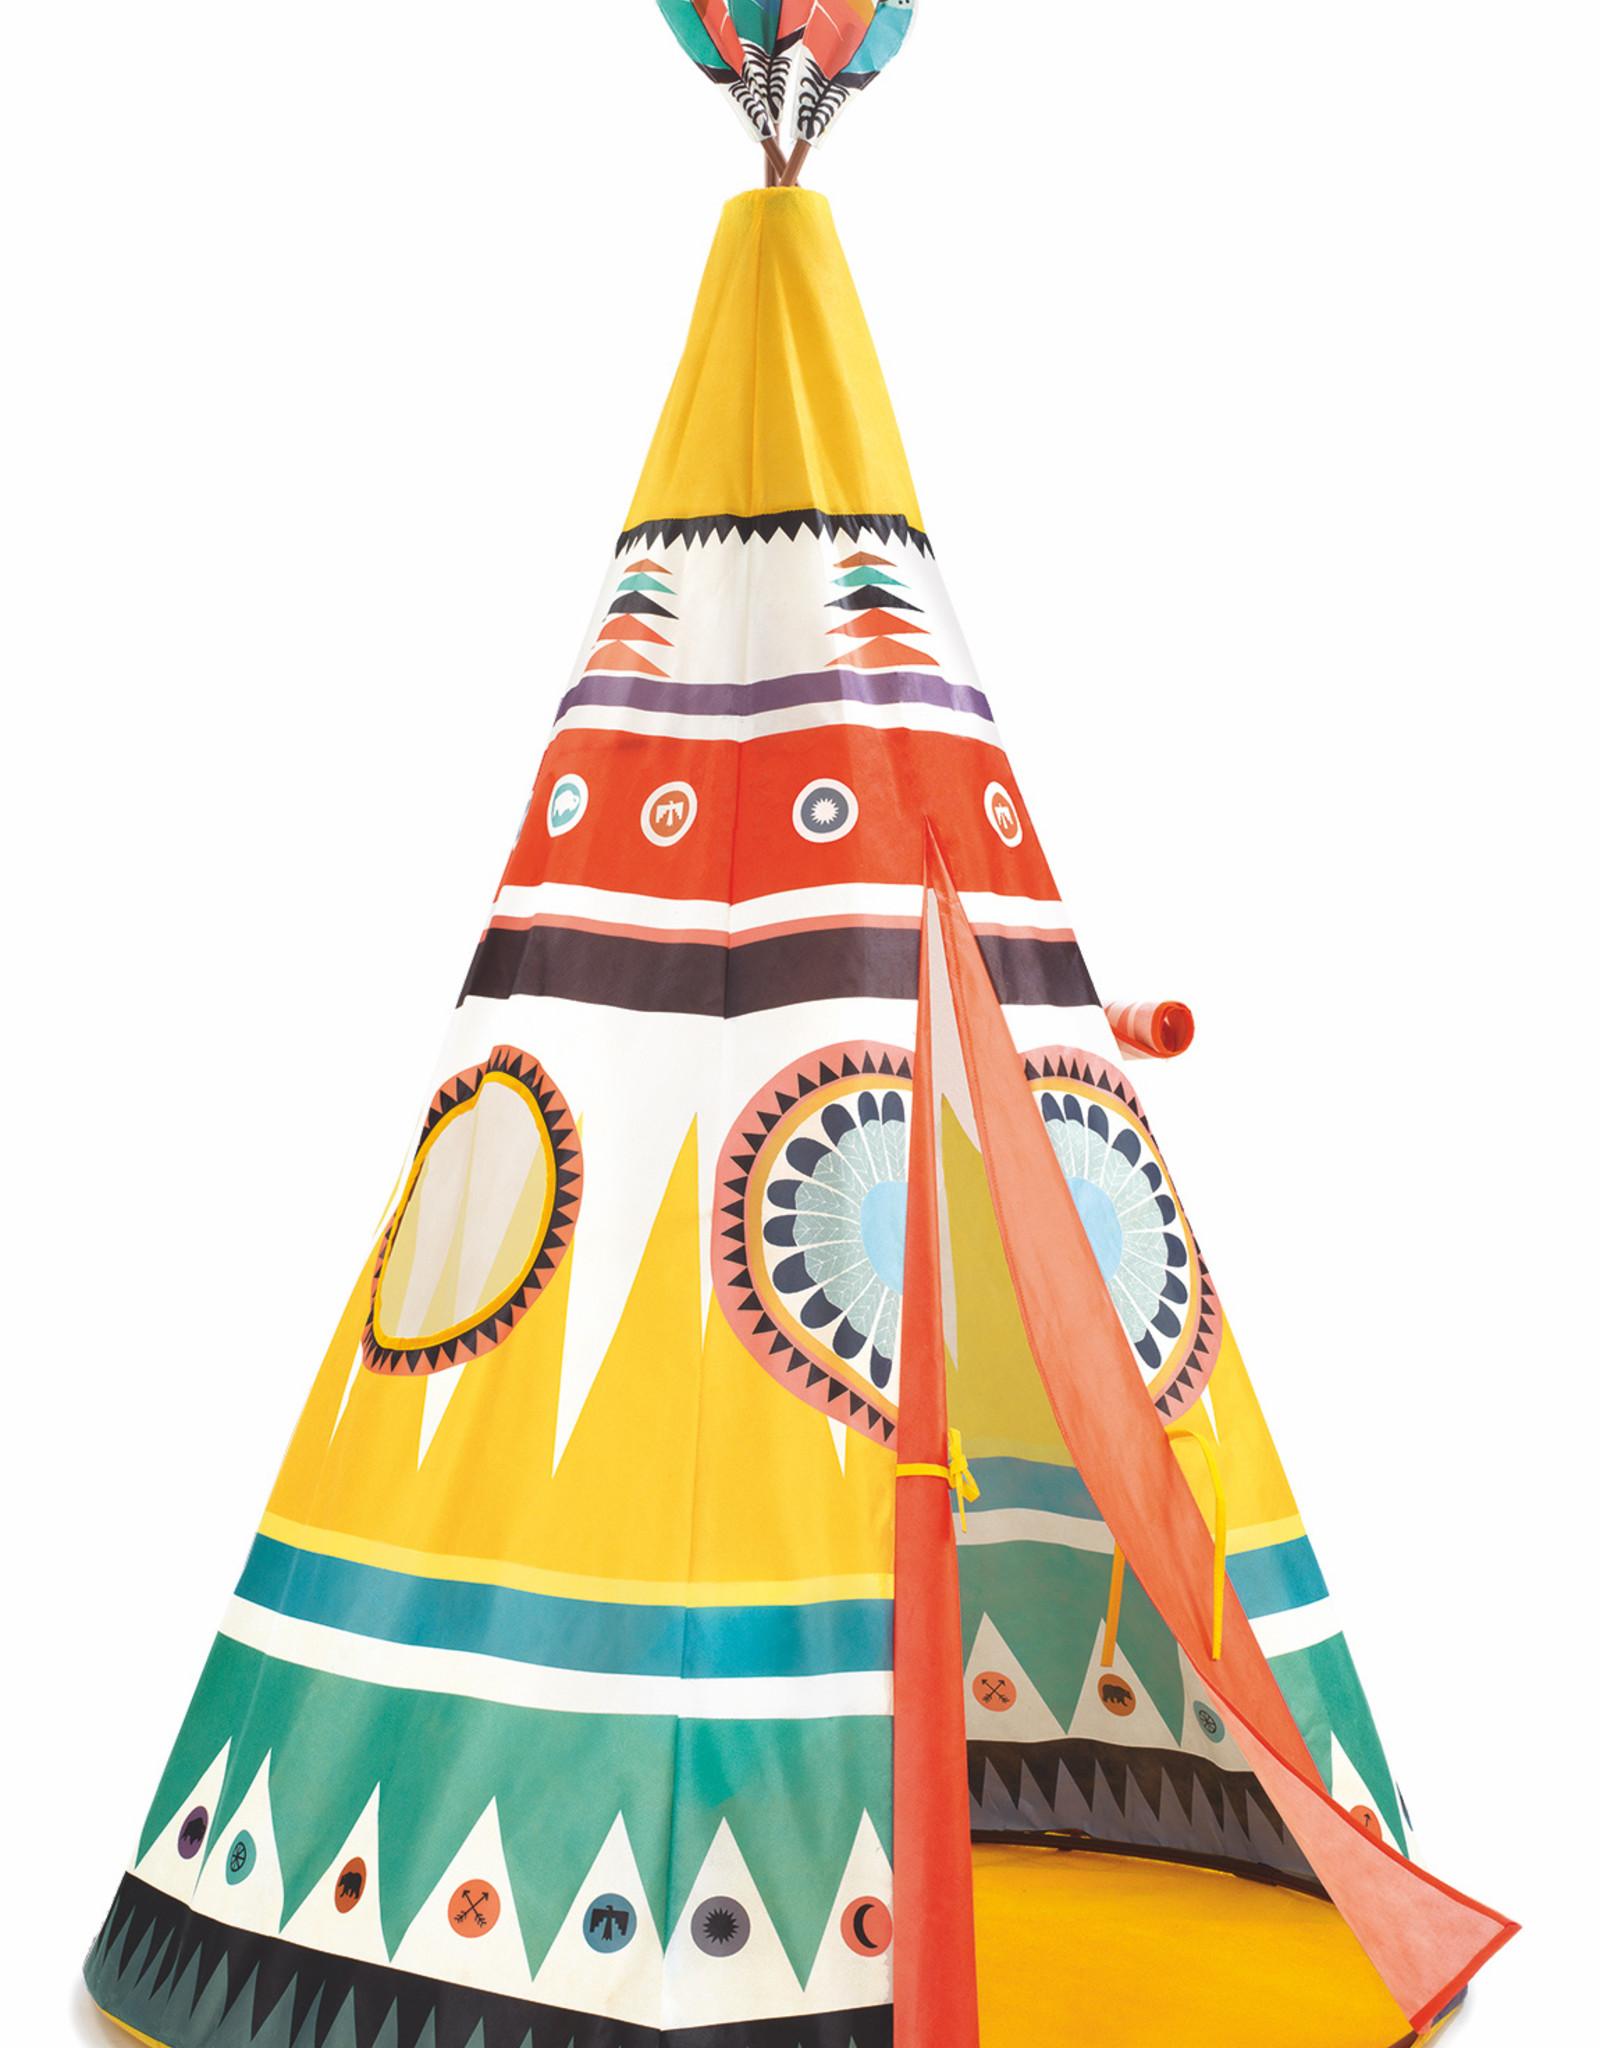 Djeco Play Tent Teepee